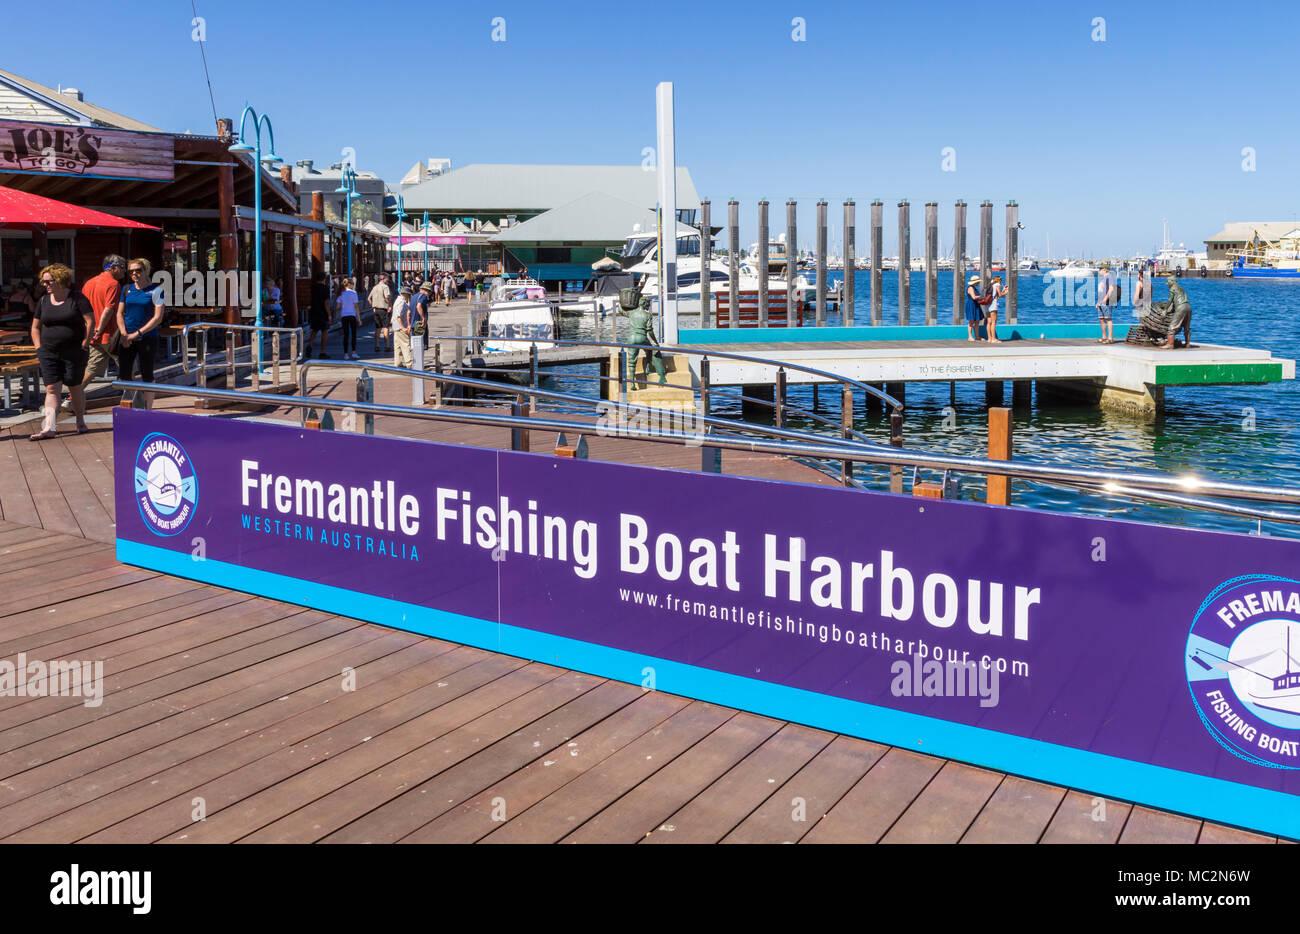 e2062b0c267 Fremantle Australia Stock Photos   Fremantle Australia Stock Images ...